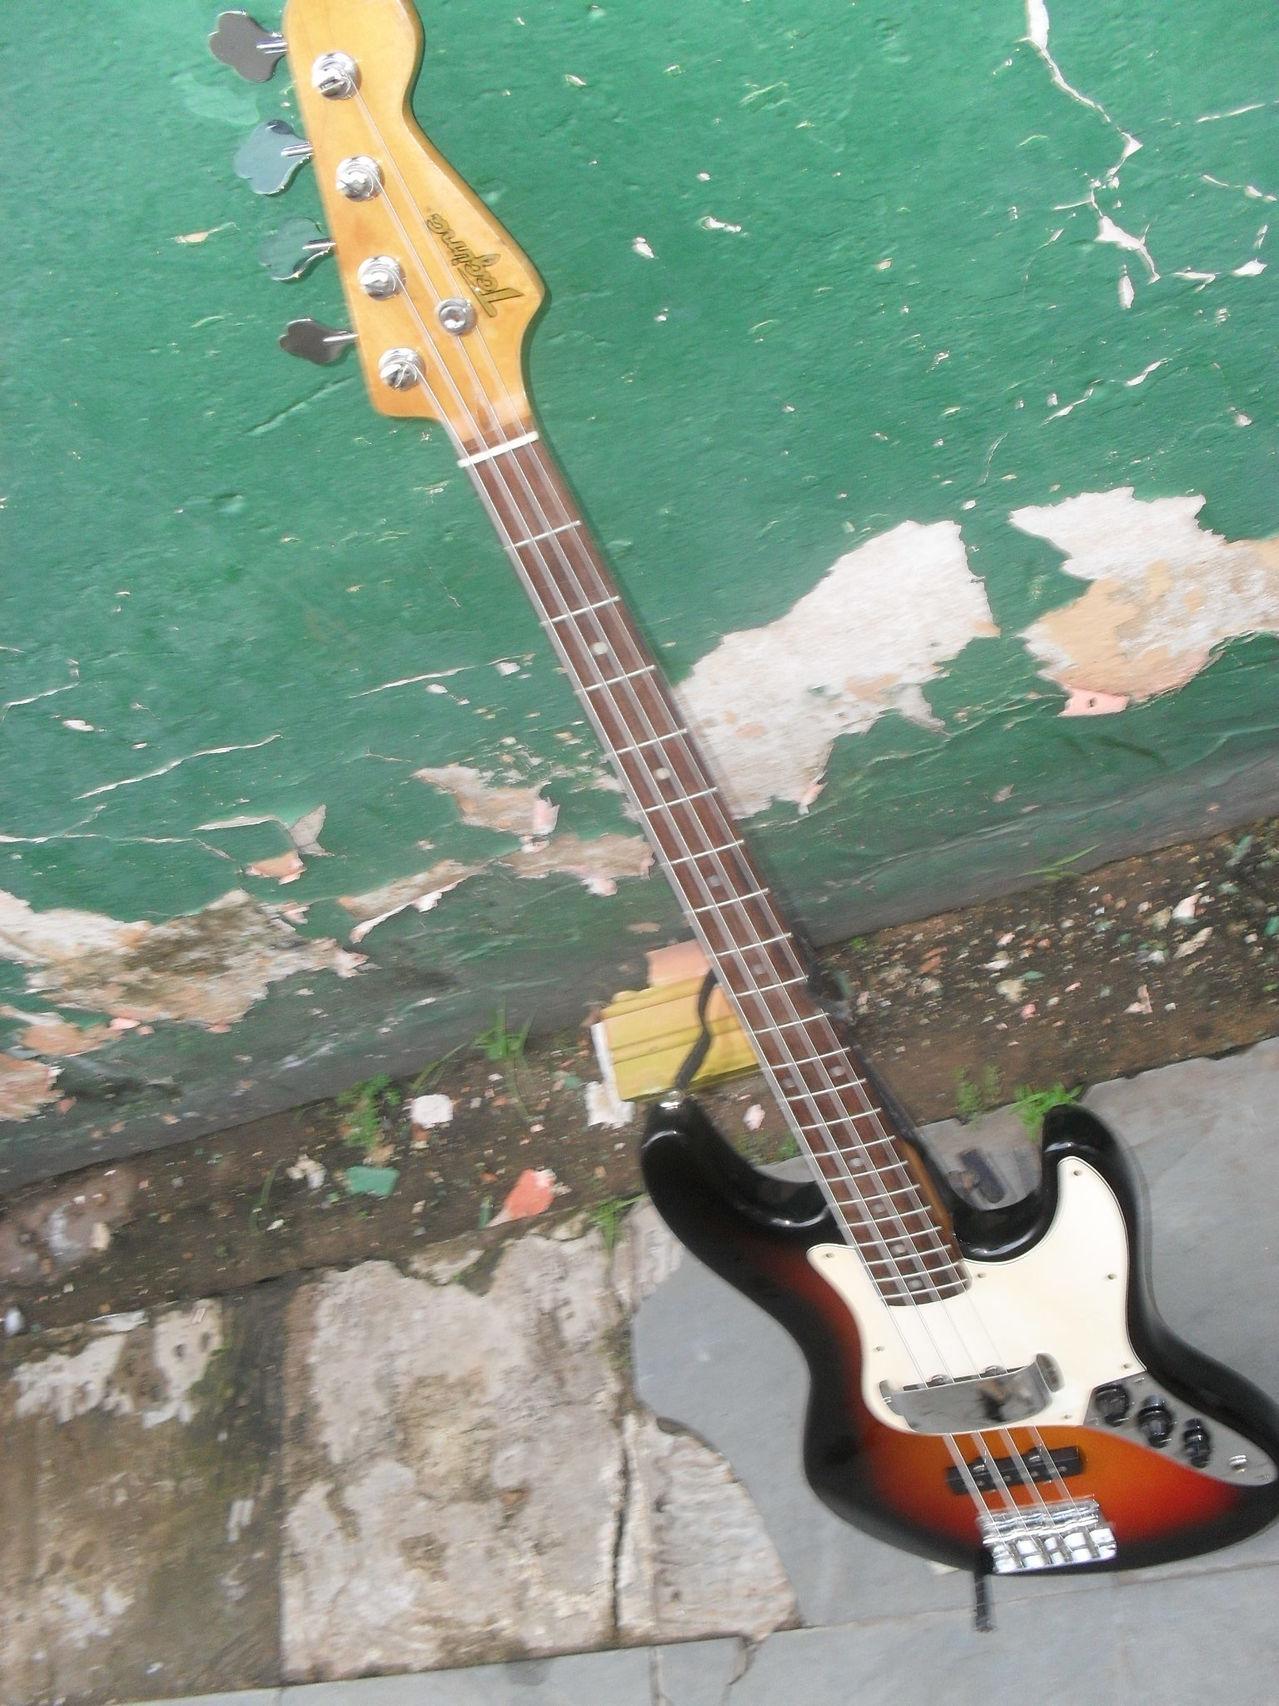 Baixo Tagima jazz bass Hand Made in Brazil - Página 2 SDC15972